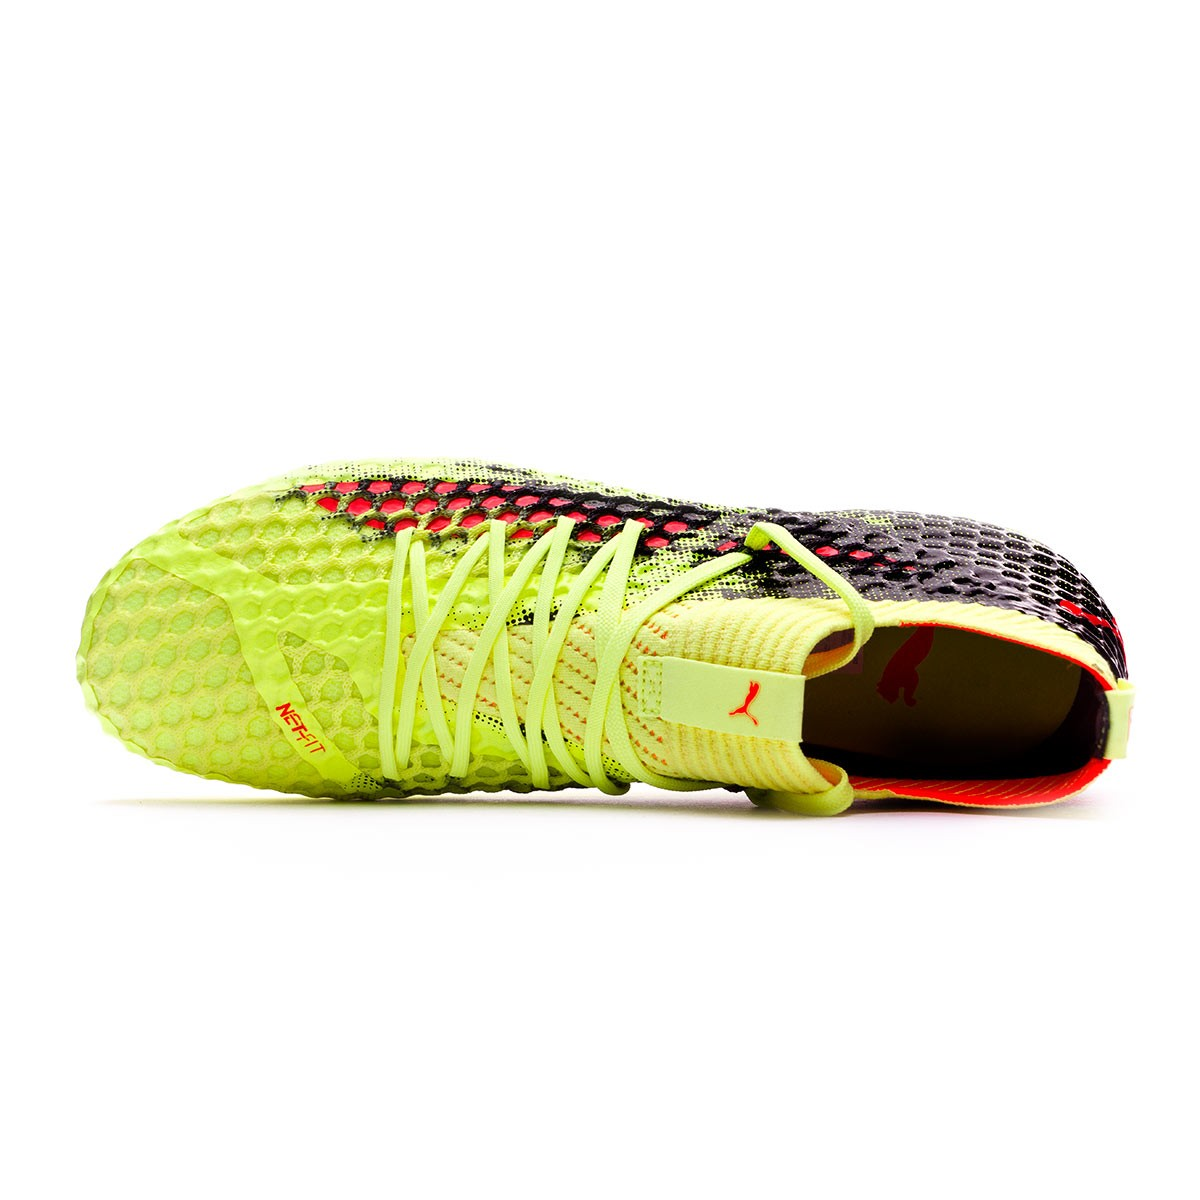 7fd4da456f499 Zapatos de fútbol Puma Future 18.1 Netfit FG Fizzy Yellow-Red Blast-Puma  Black - Tienda de fútbol Fútbol Emotion